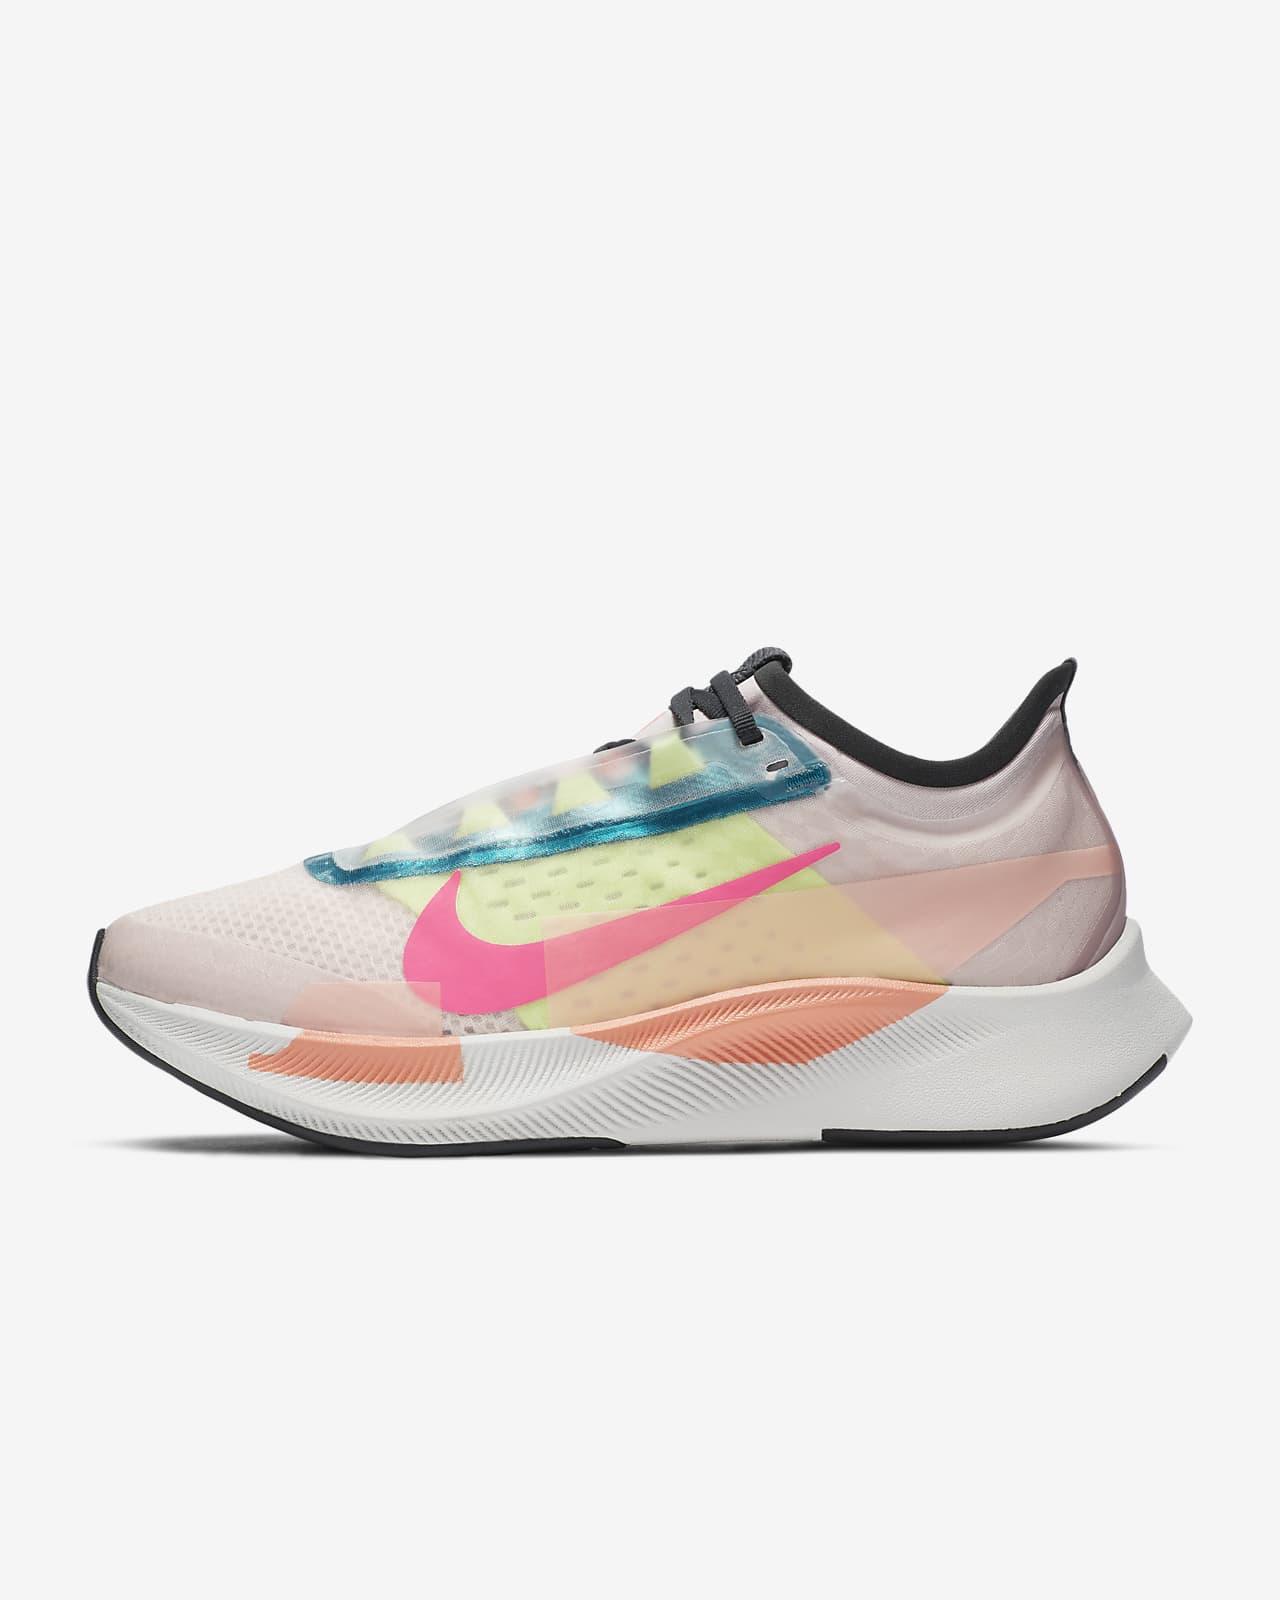 Sapatilhas de running Nike Zoom Fly 3 Premium para mulher